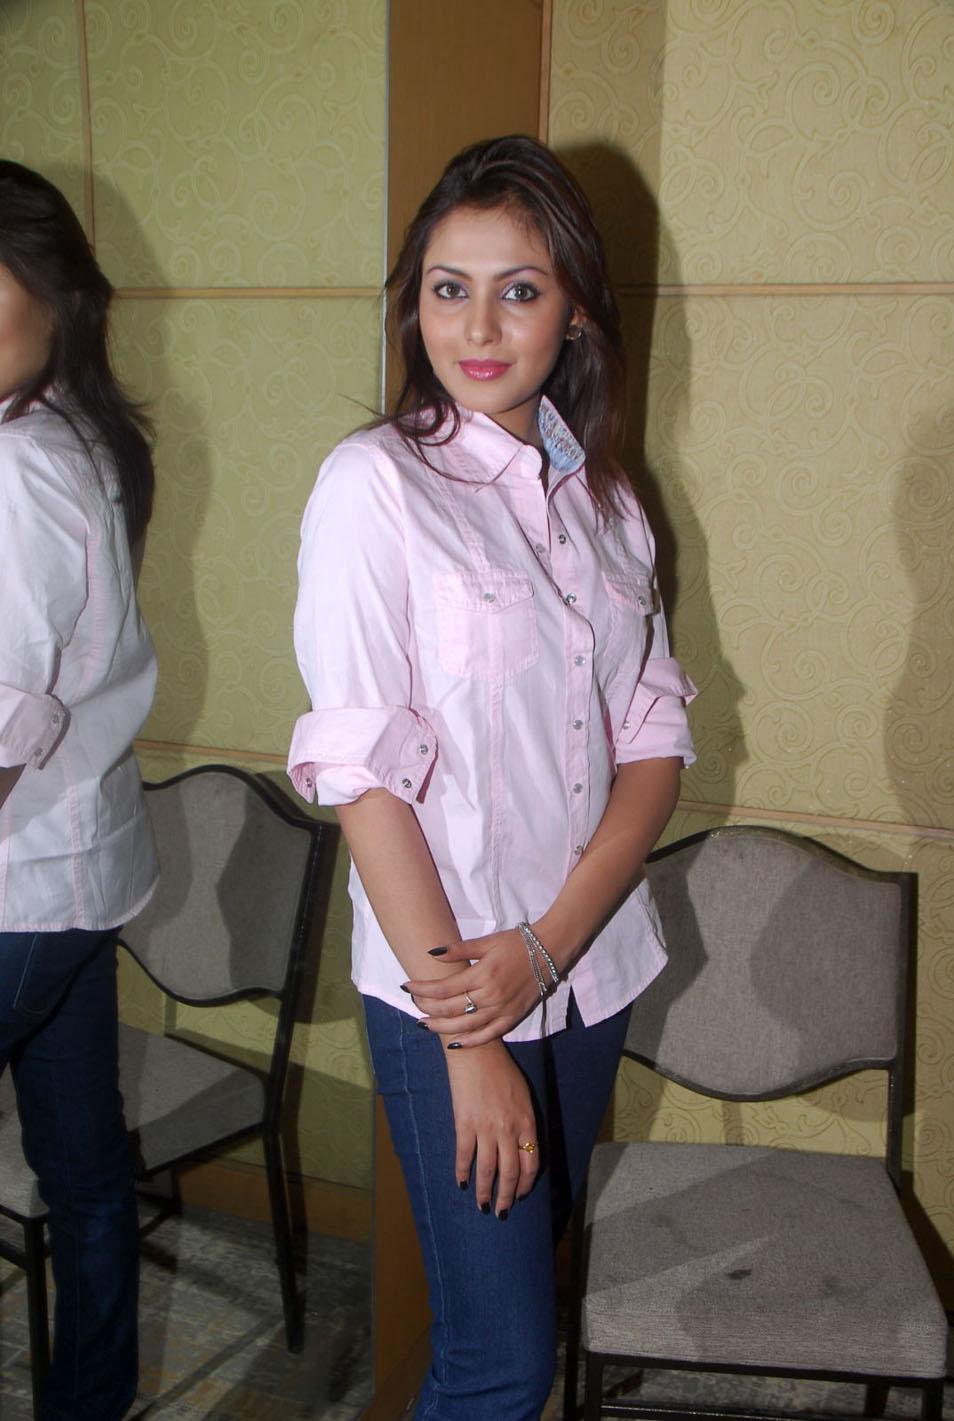 Madhu Shalini Hot Sex Ele madhu shalini in jeans and men's shirtsola con mi desesperaciÓn